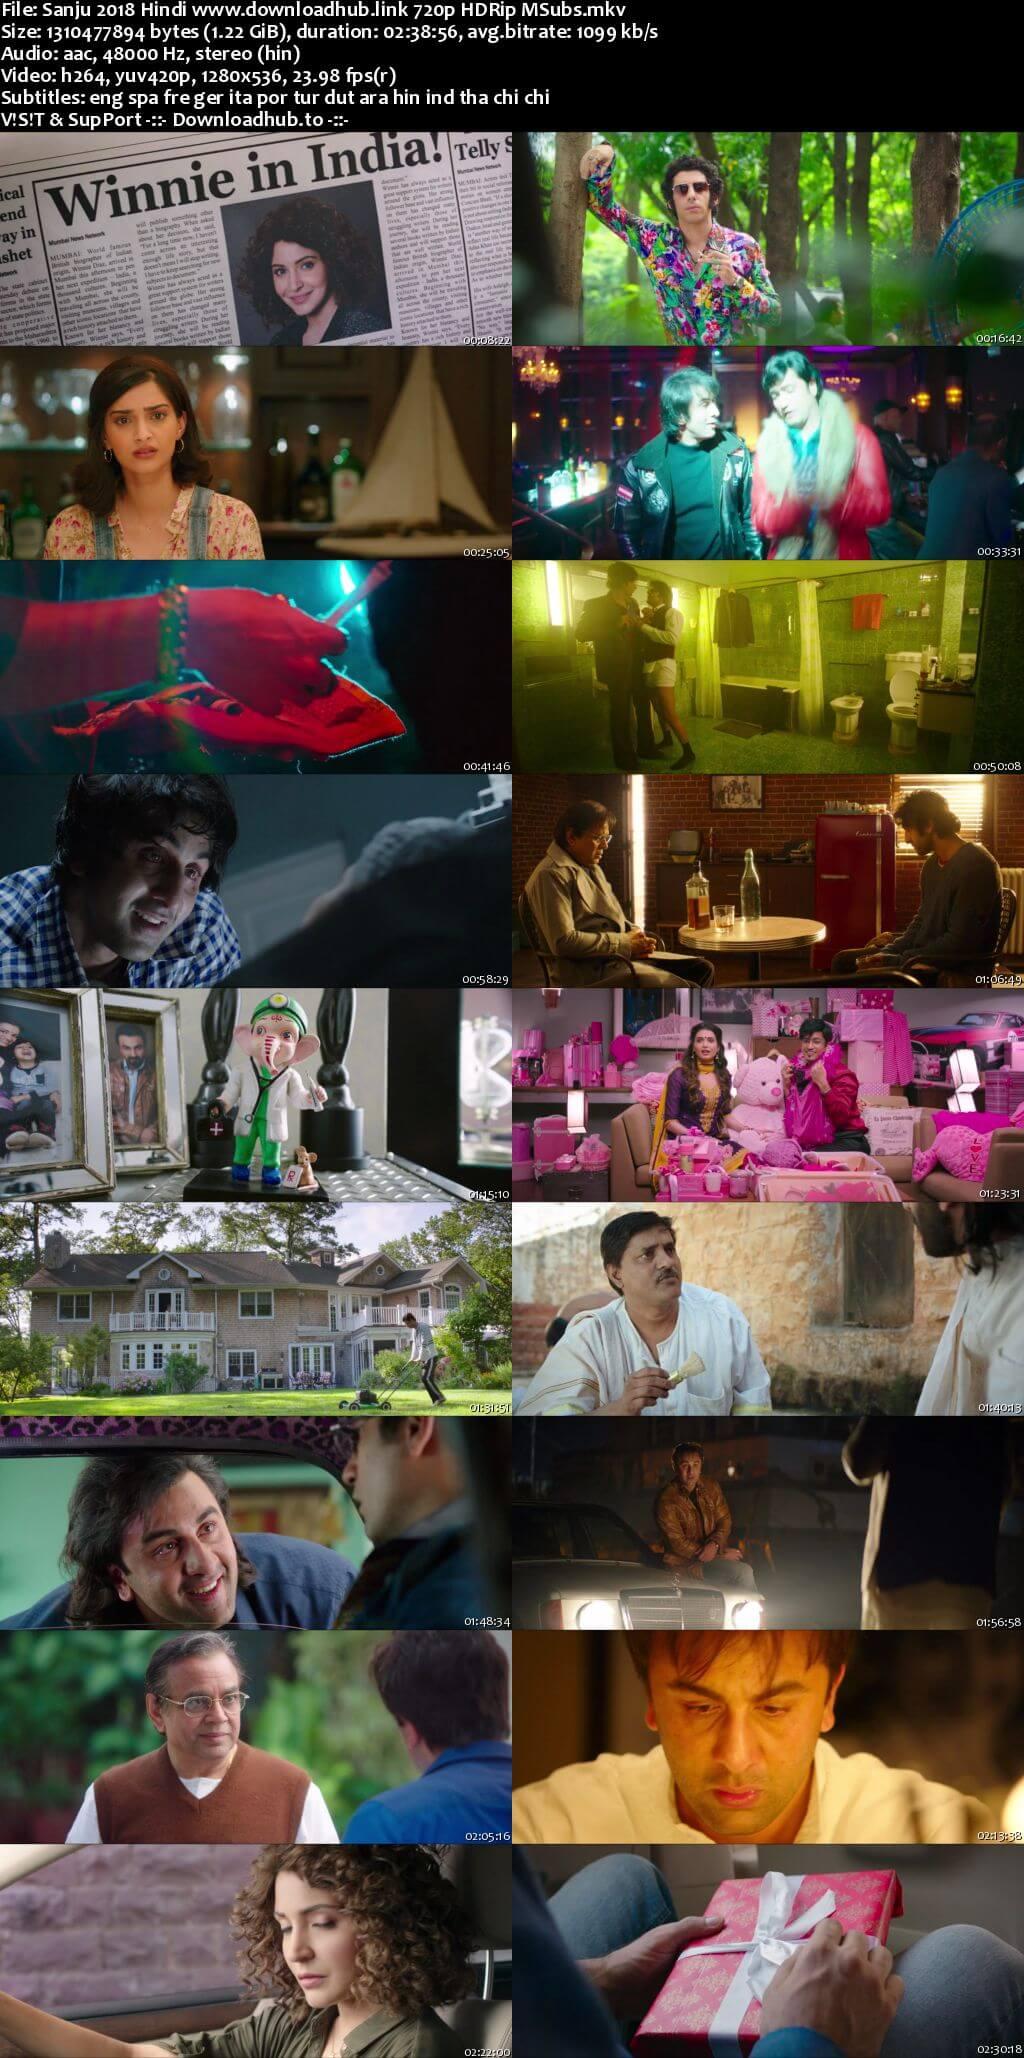 Sanju 2018 Hindi 720p HDRip MSubs